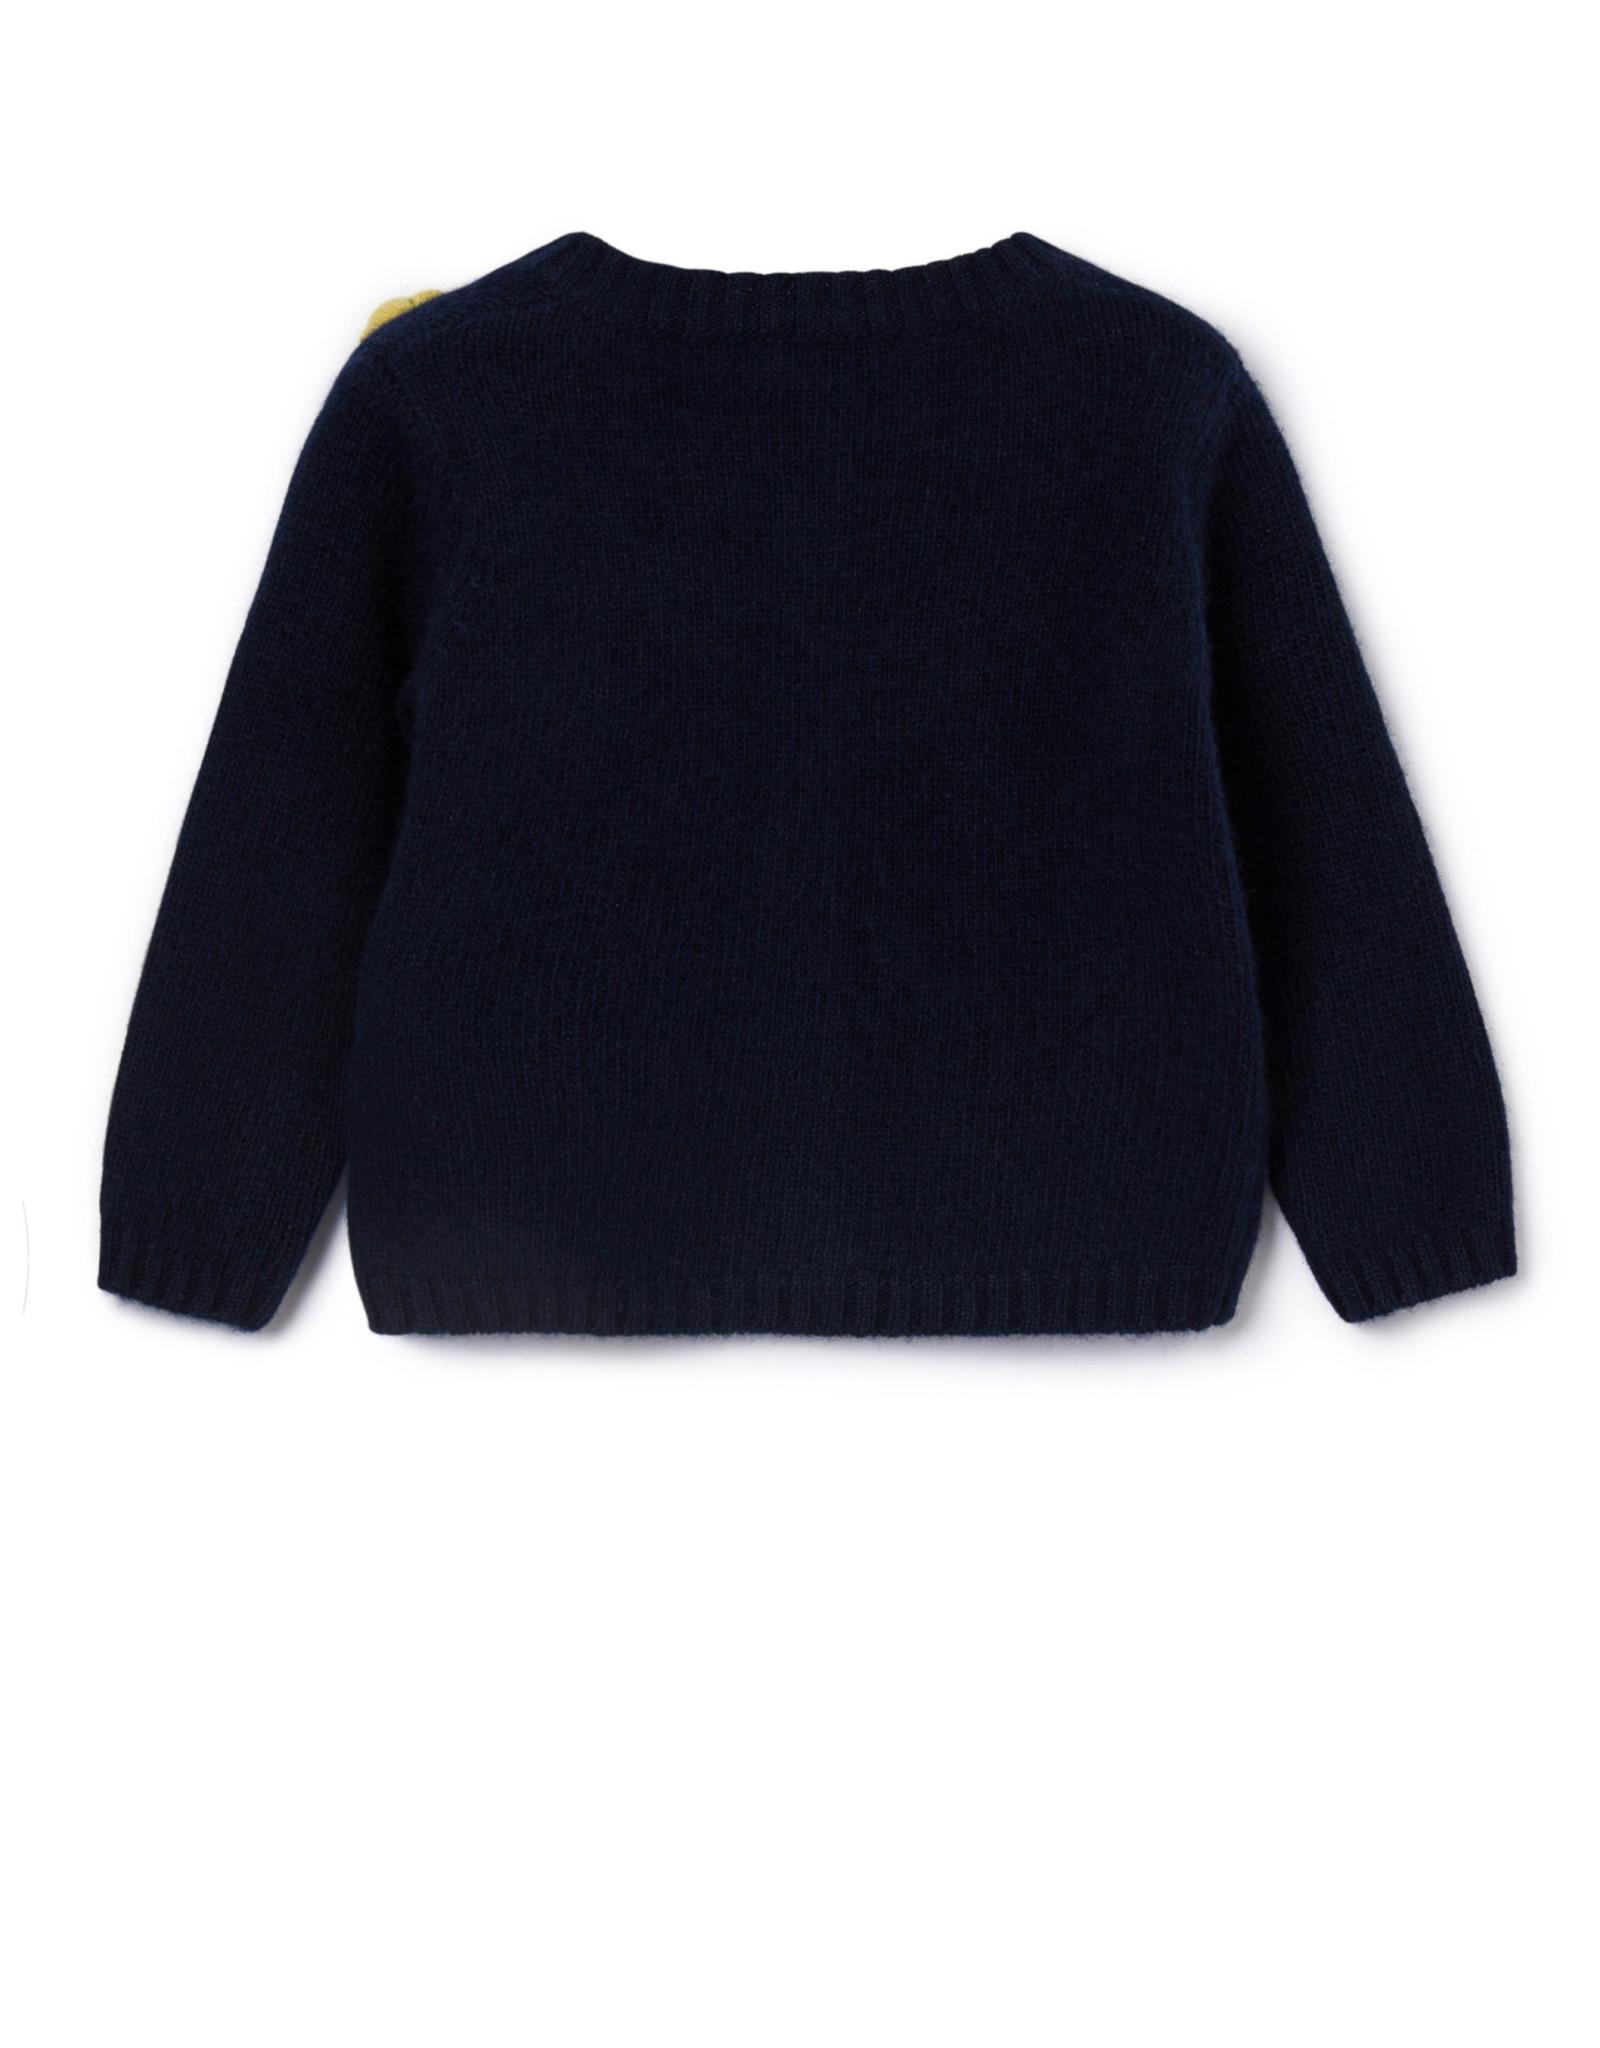 IL GUFO Cardigan Navy Blue/Burgundy